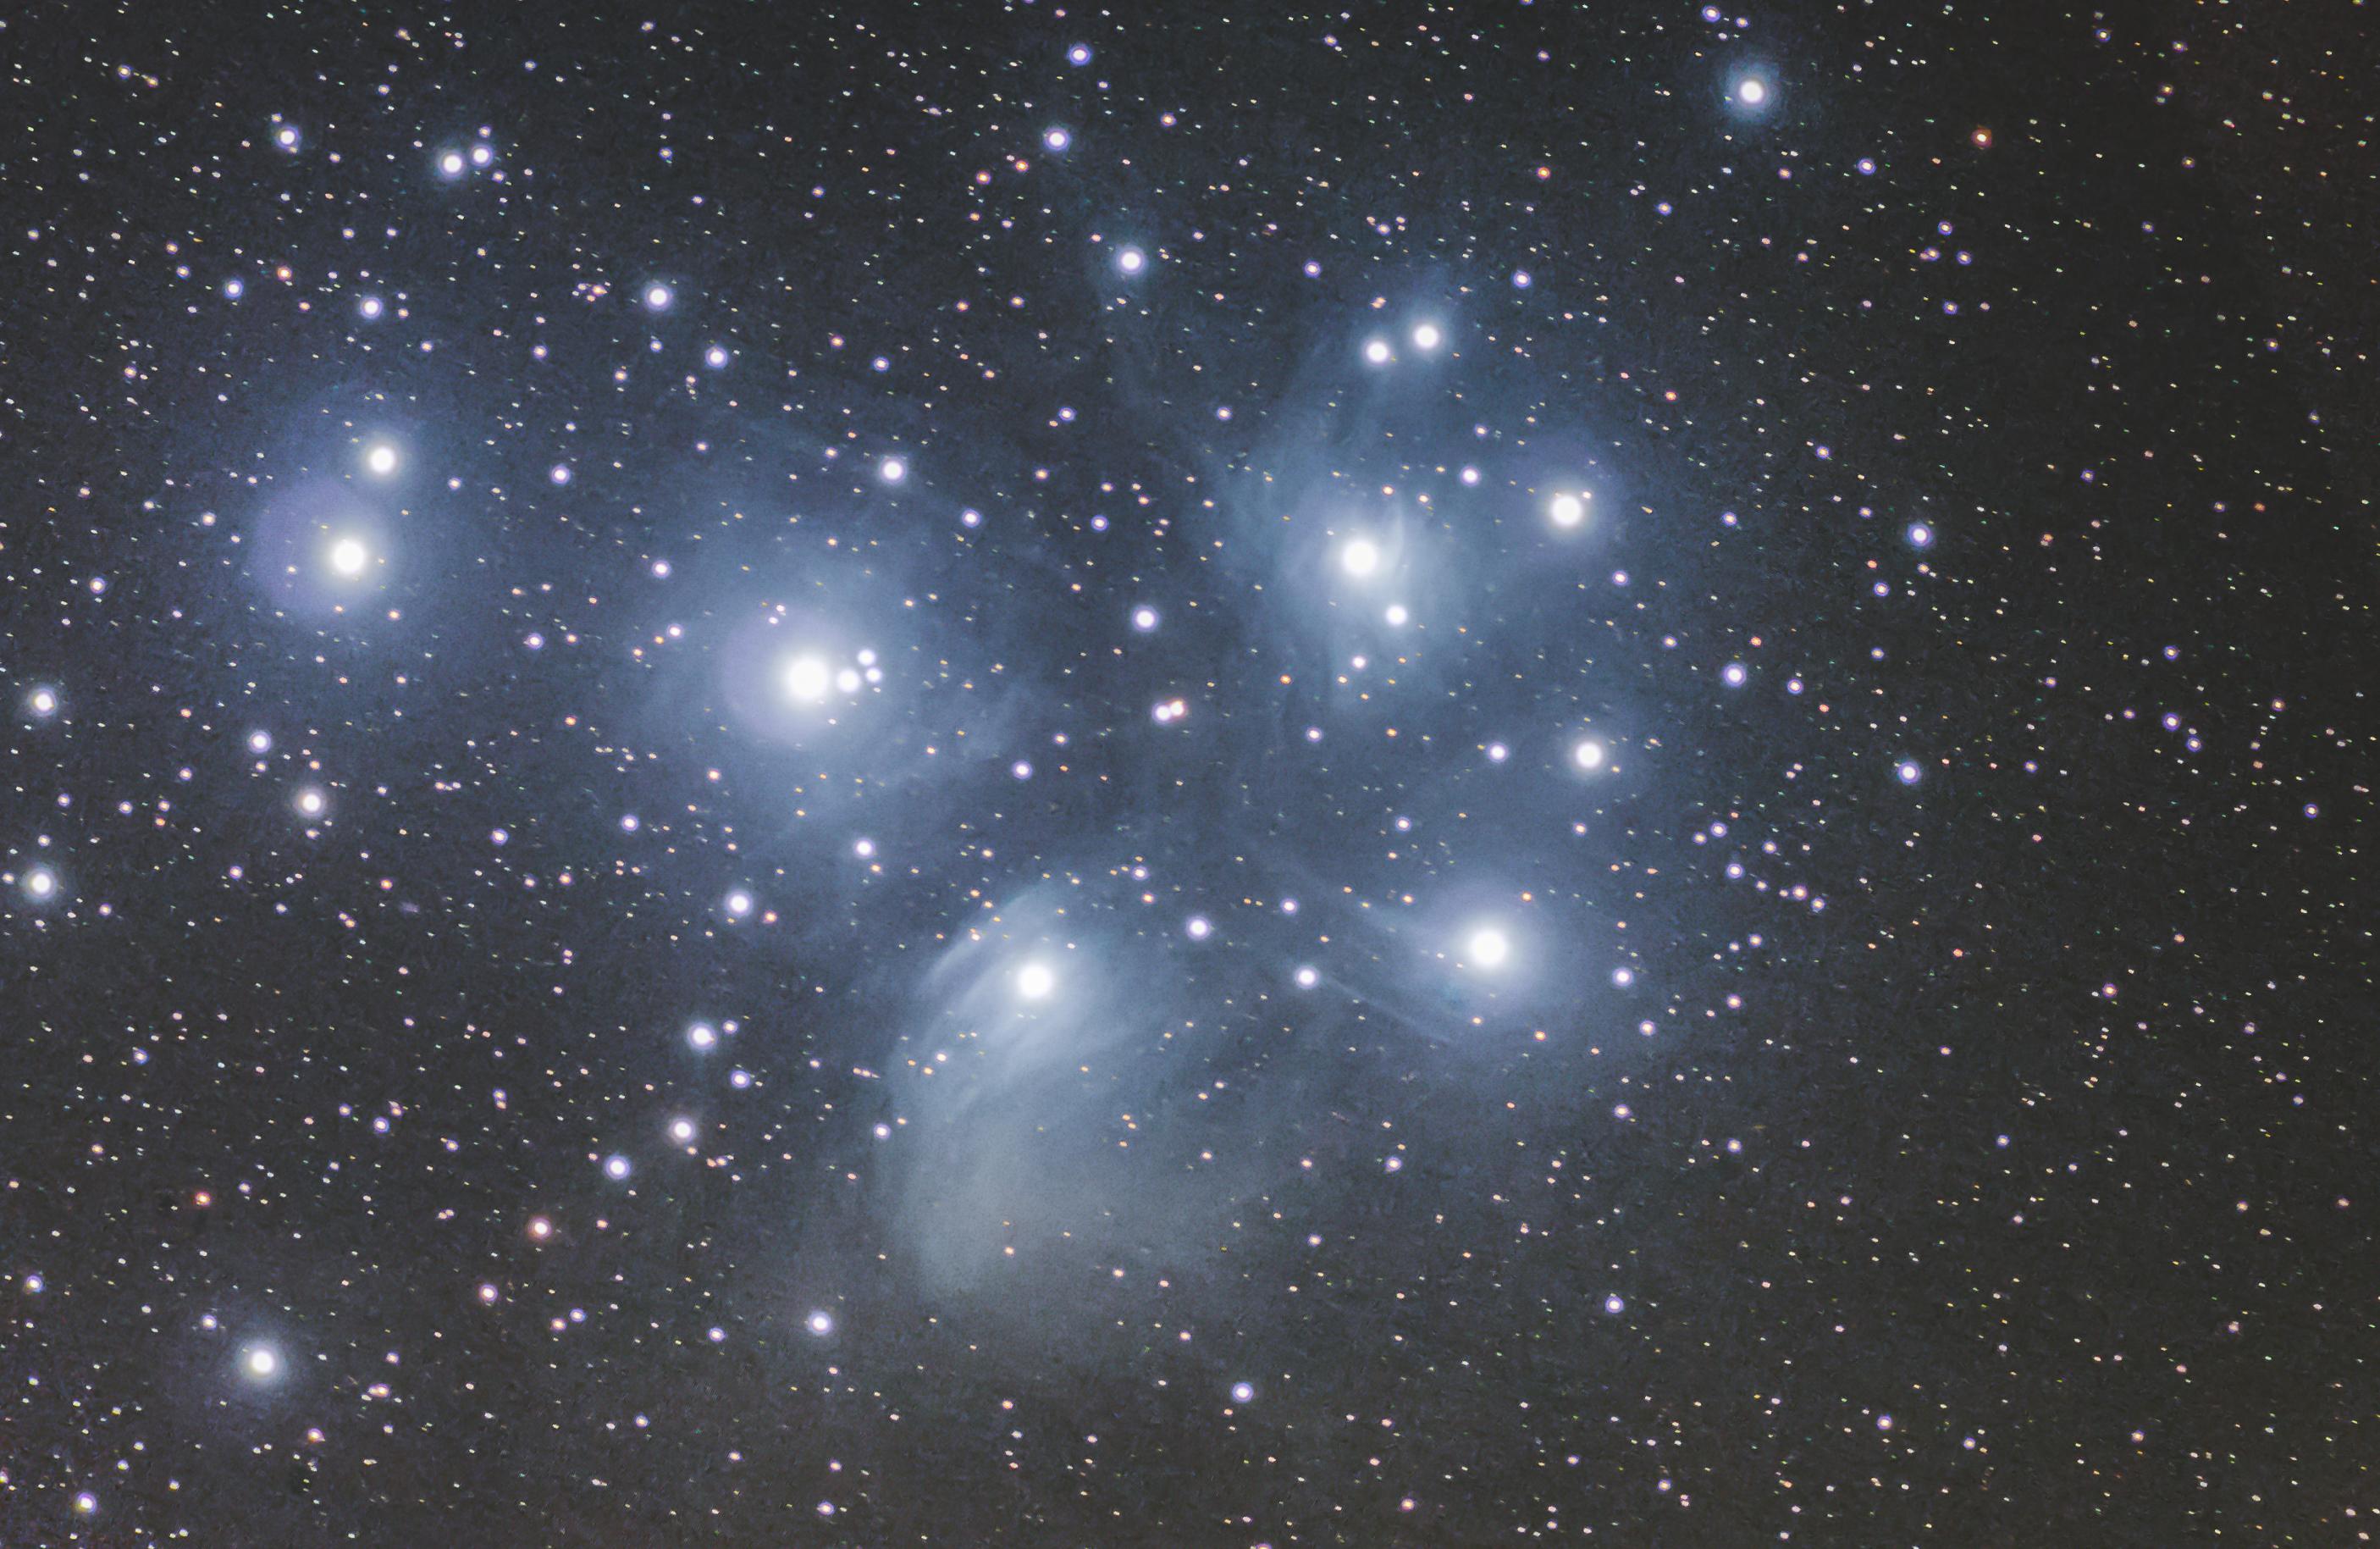 m45, messier 45, pleiades, seven sisters, 7 sisters,